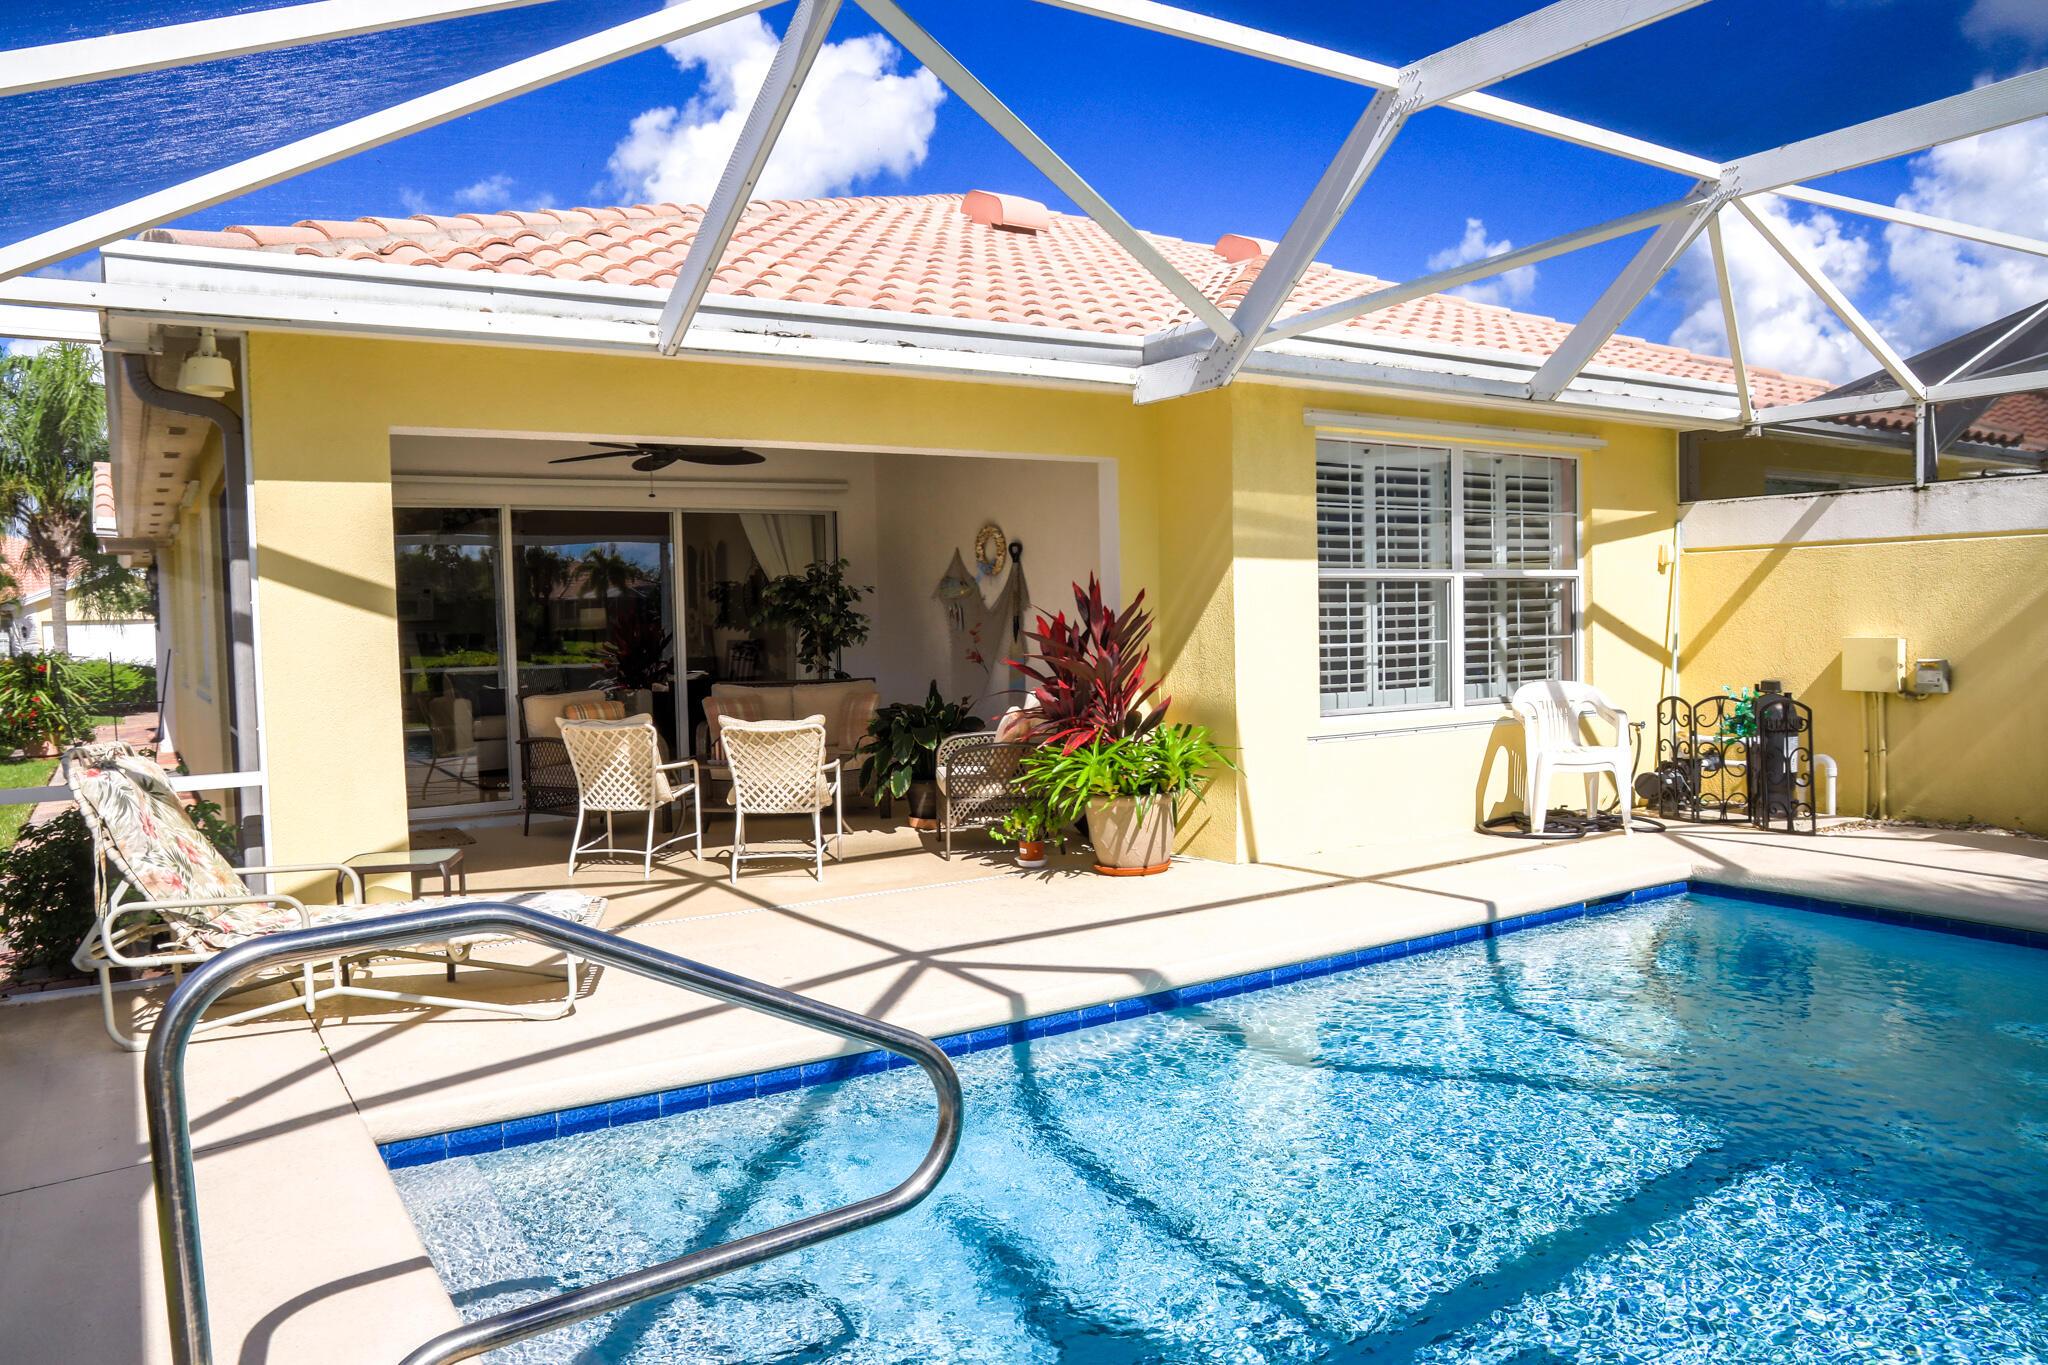 10476 Stratton, Port Saint Lucie, Florida 34987